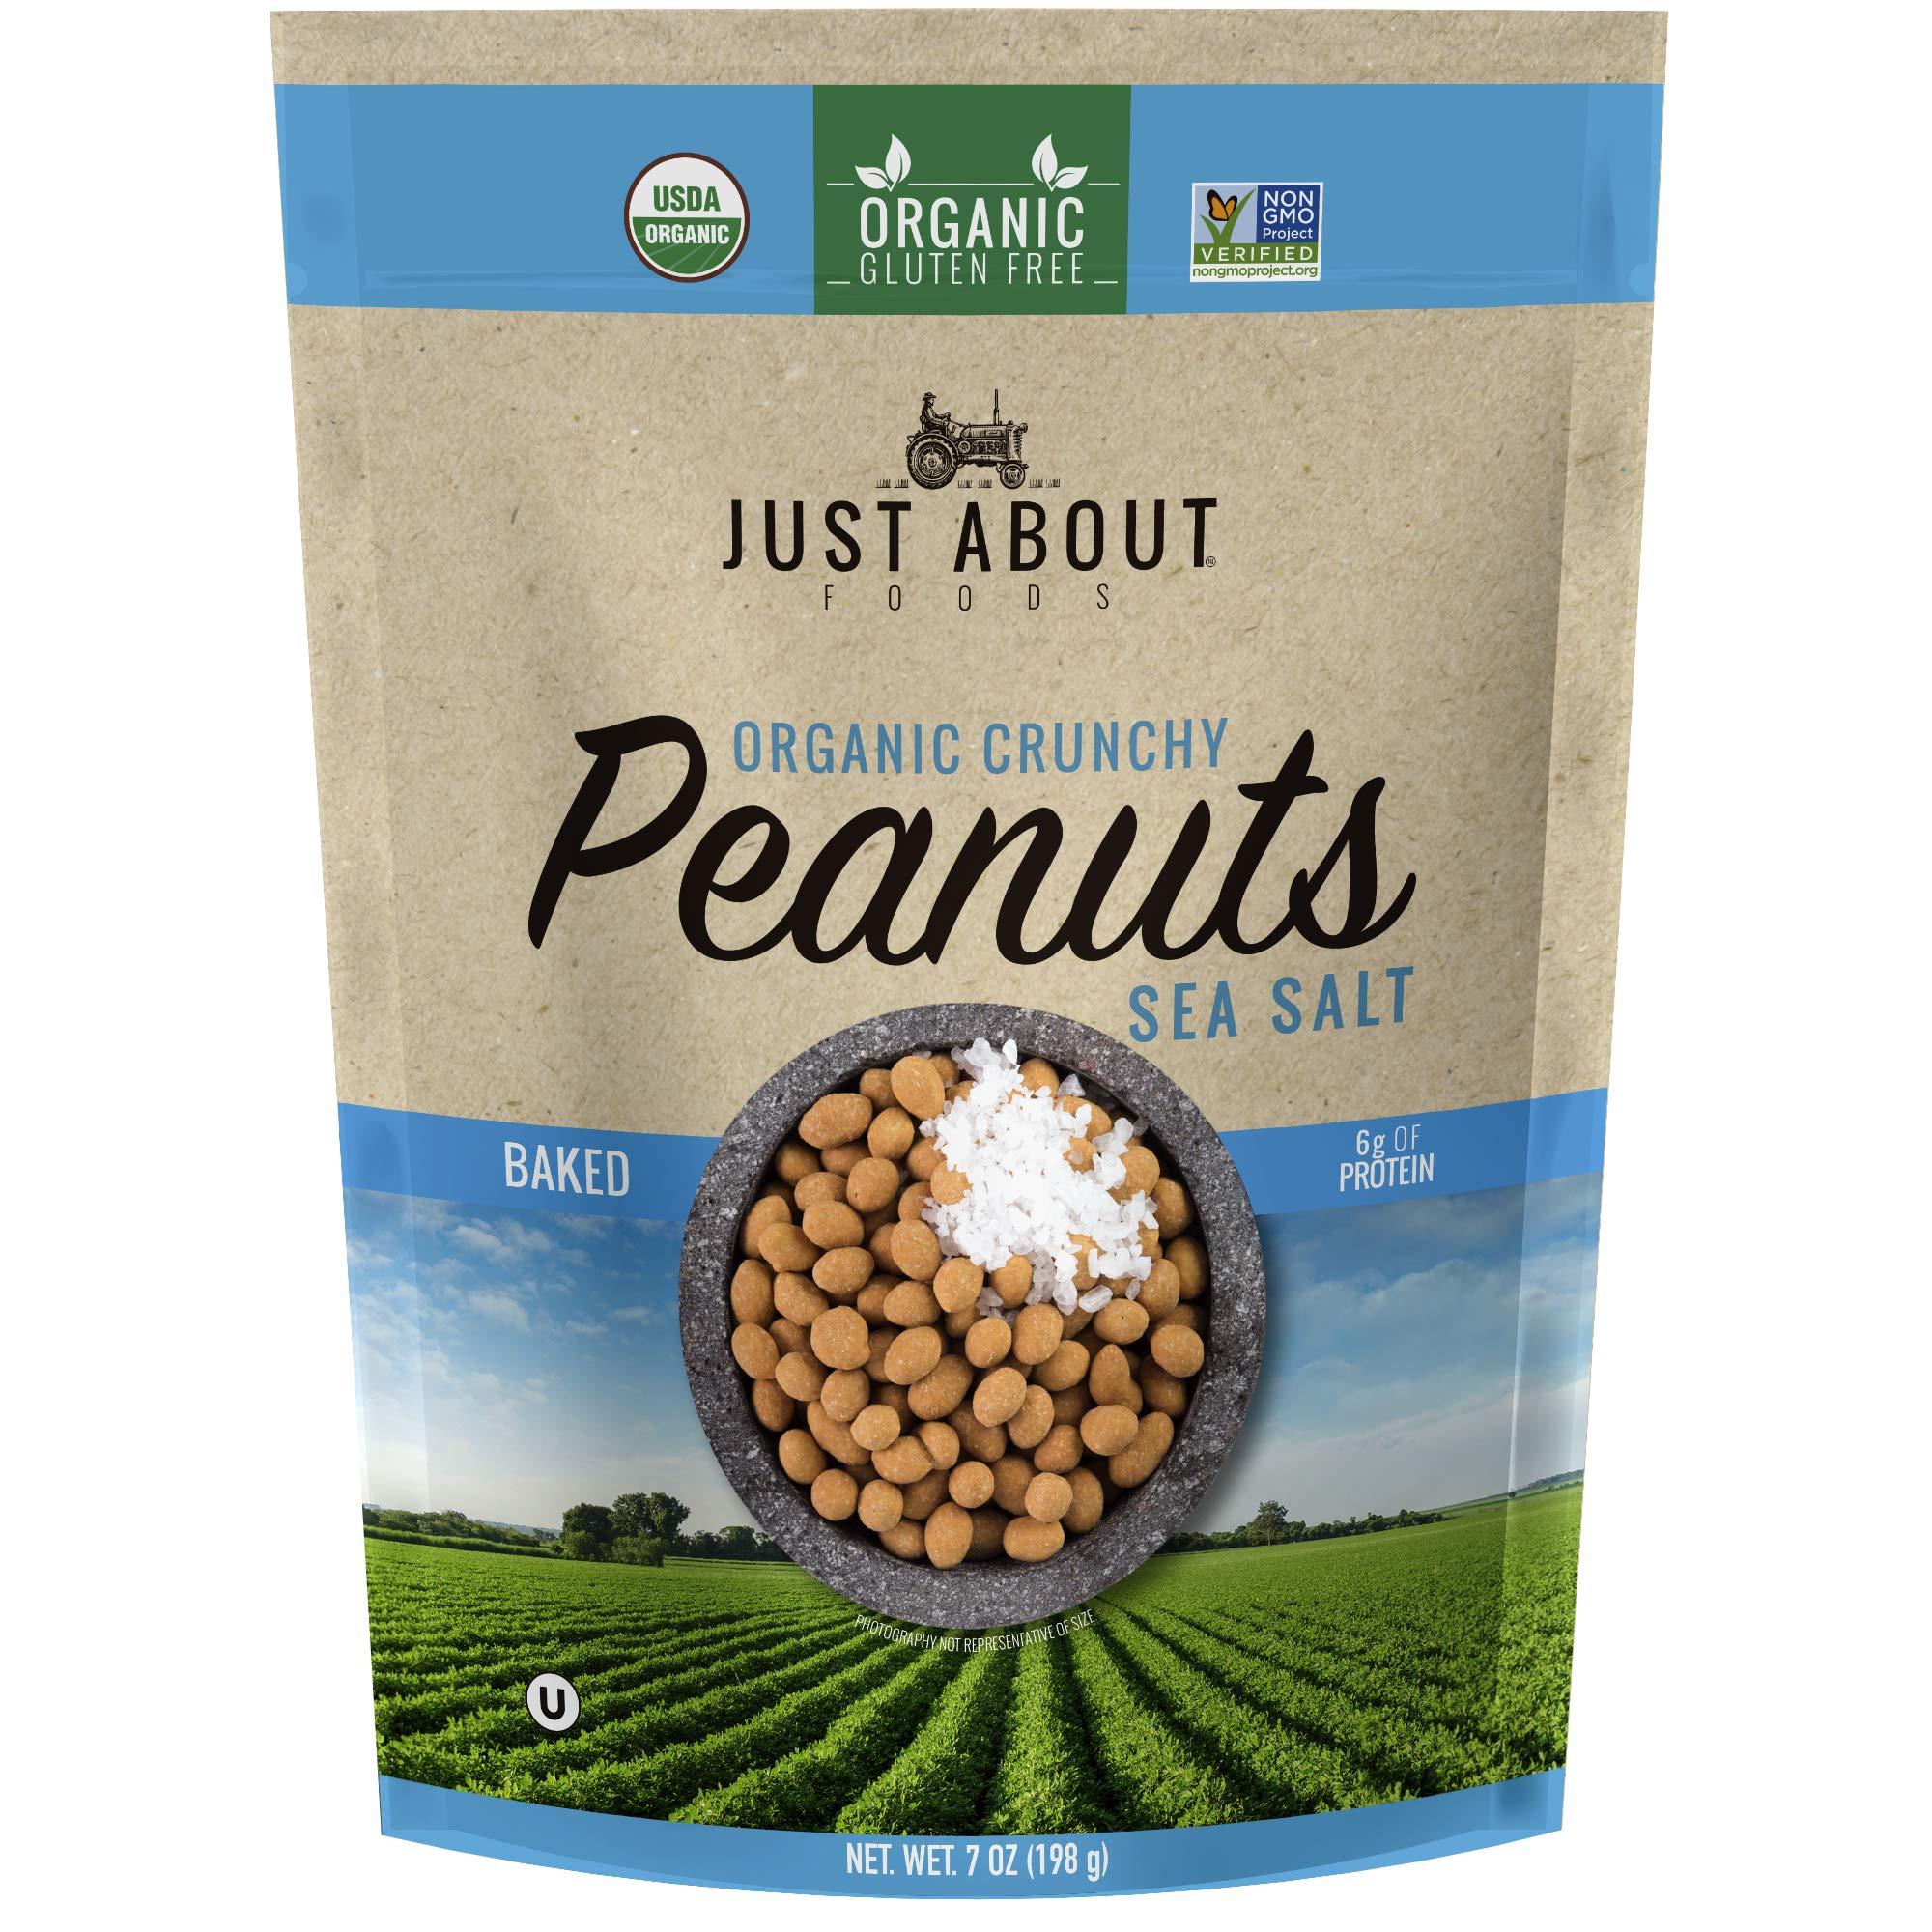 Organic Crunchy Peanuts Sea Salt 7 oz. (198g) Just About Foods